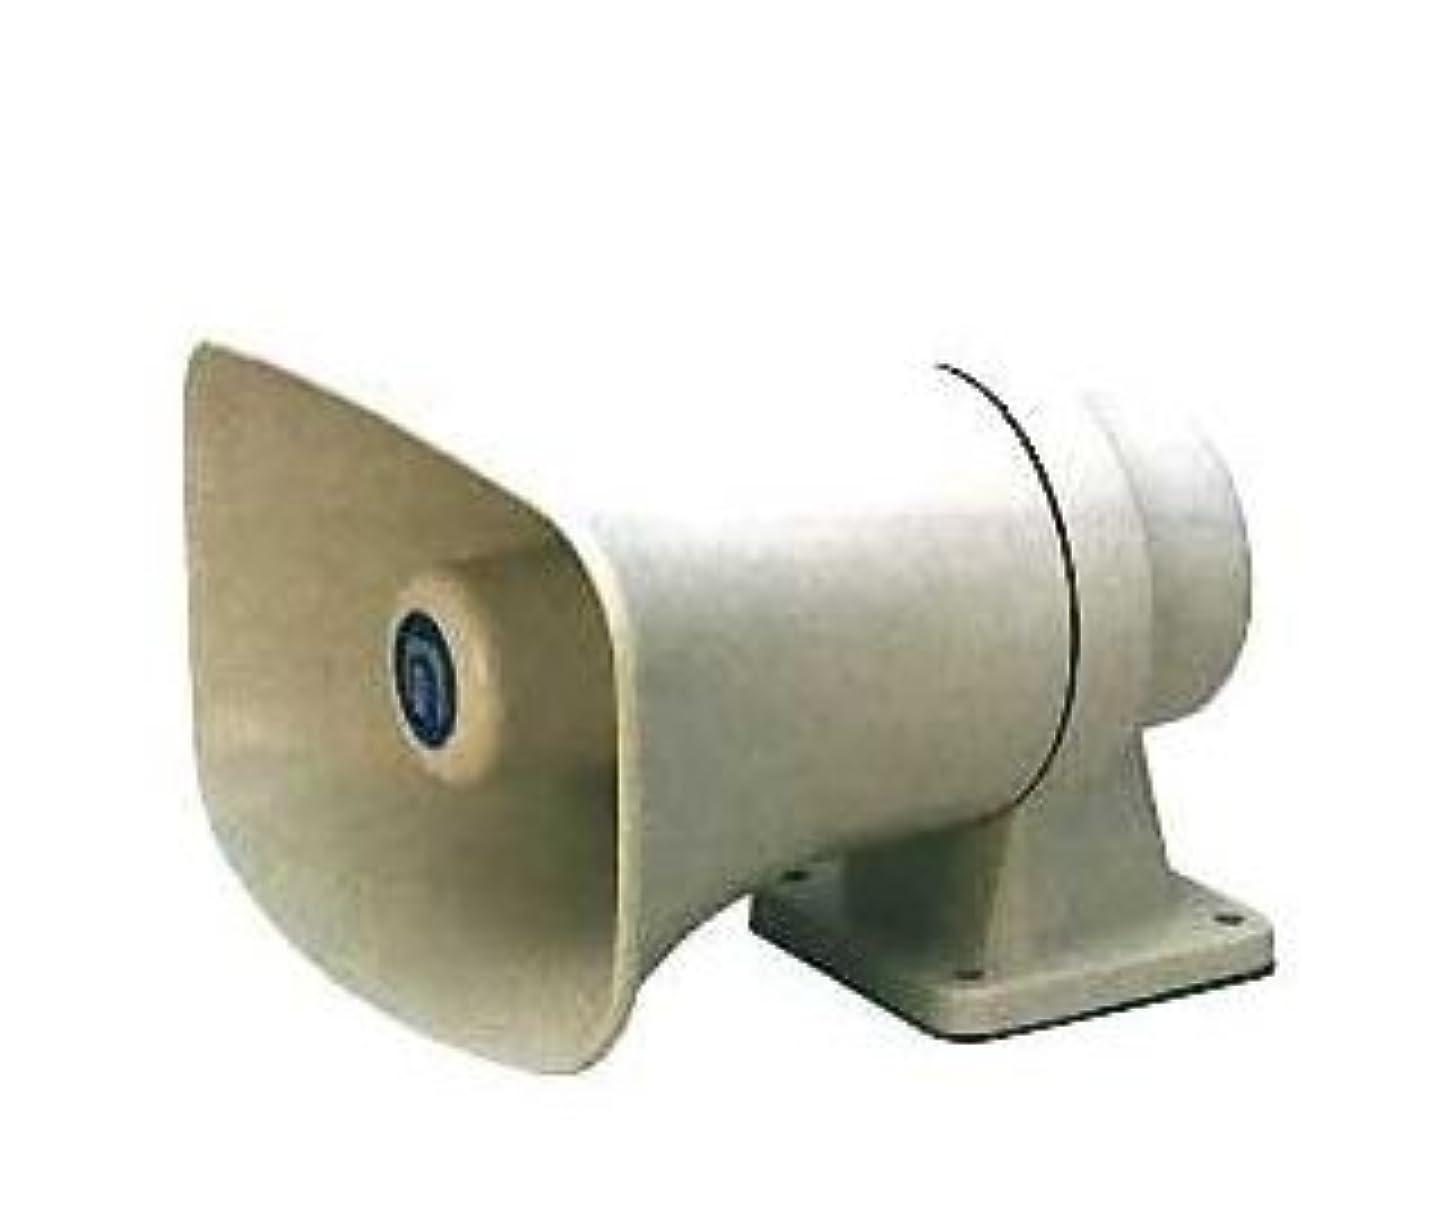 自体貼り直す合唱団小型船舶用第四種汽笛SG-122